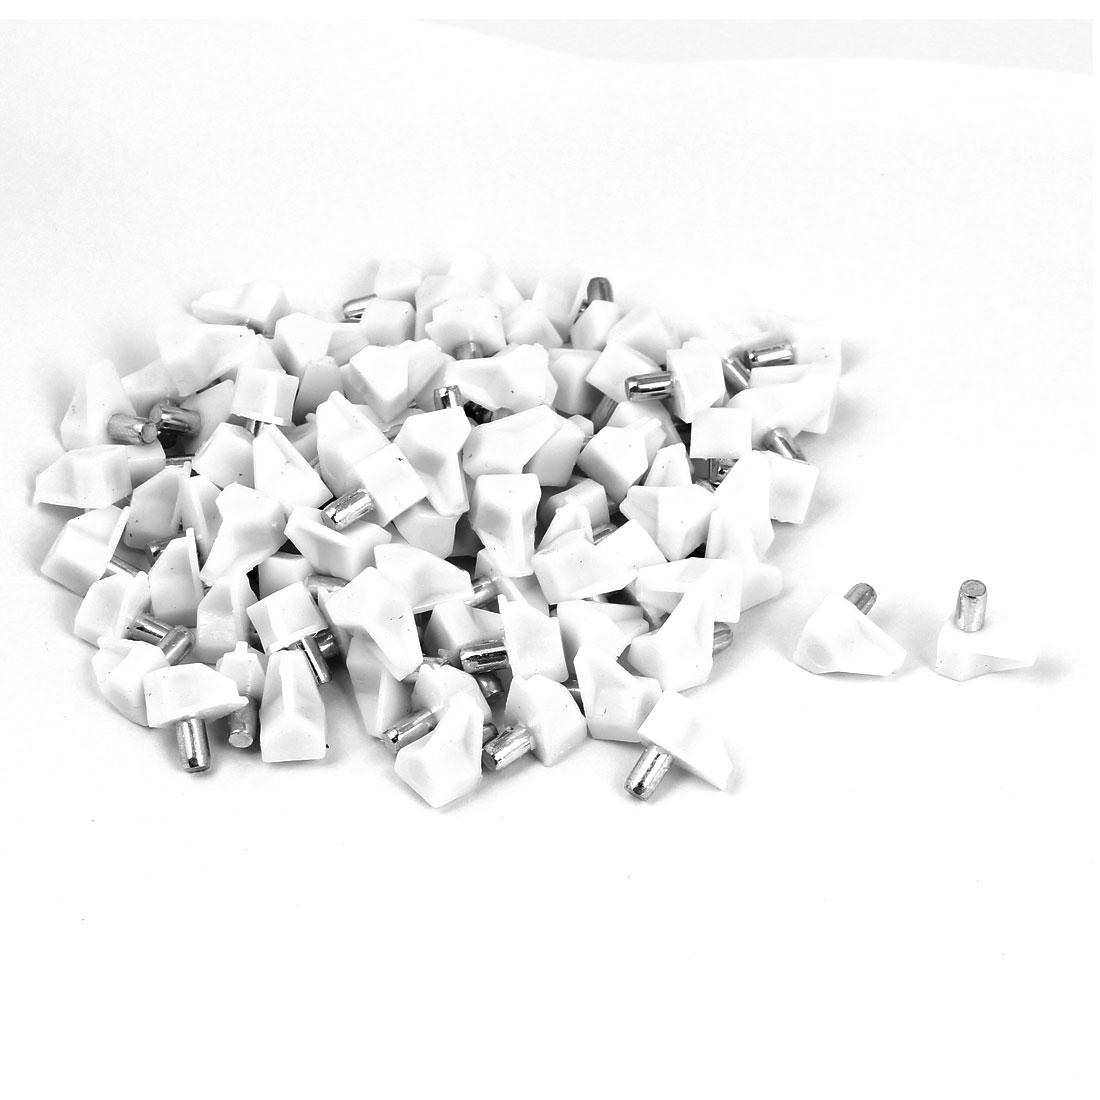 100pcs White Plastic Shelf Support Holder Studs Pins 5mm for Kitchen Cabinet